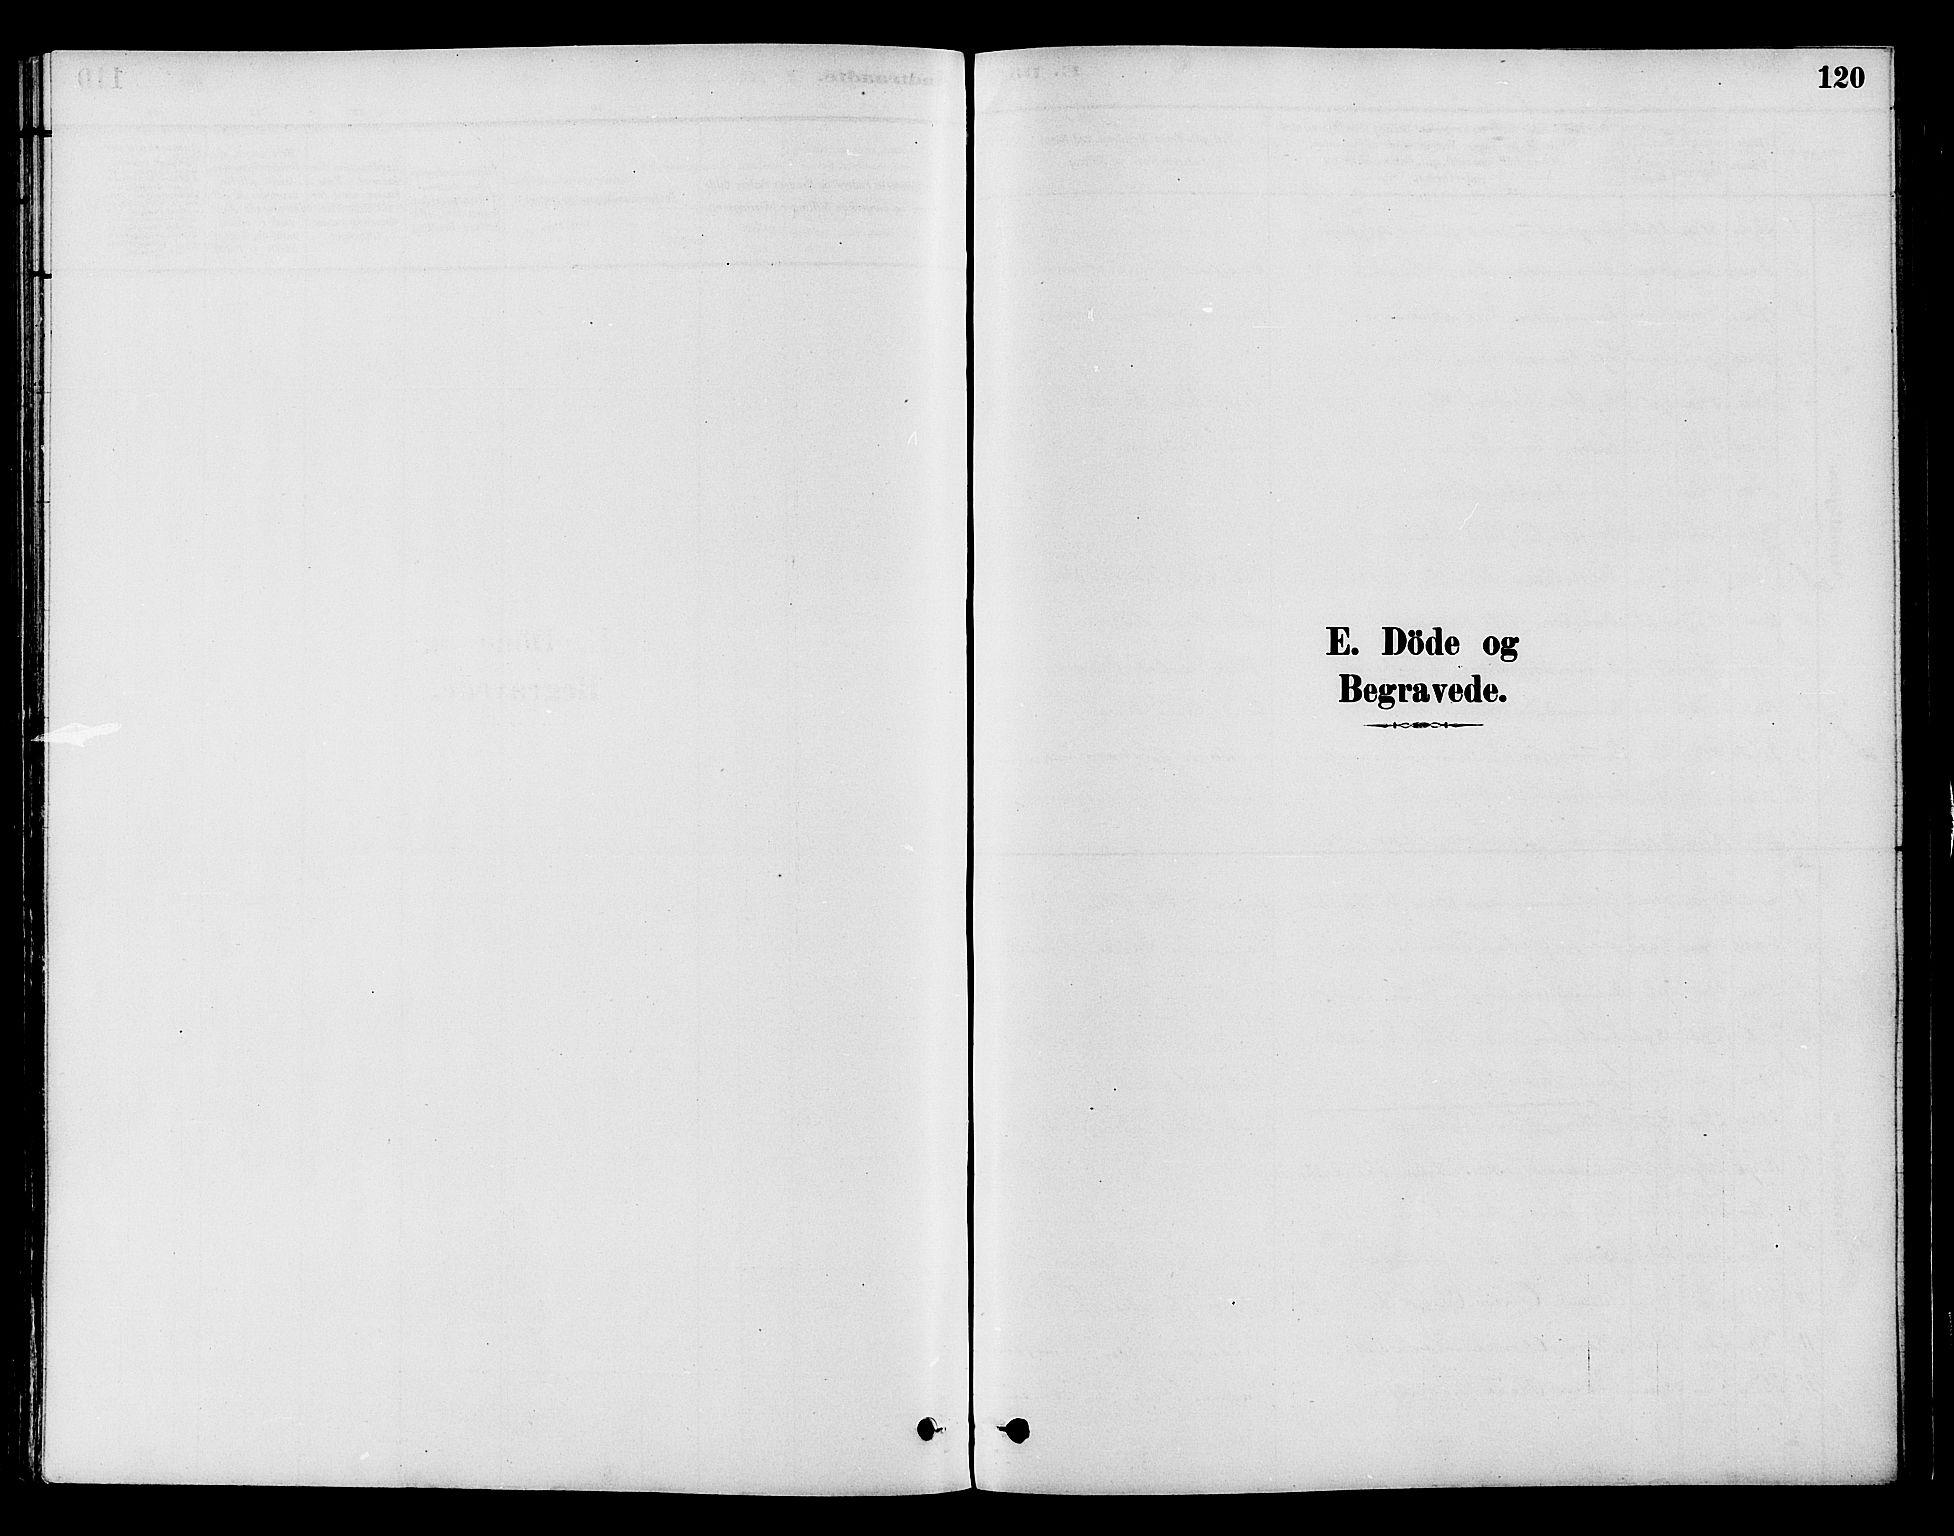 SAH, Gran prestekontor, Ministerialbok nr. 15, 1880-1888, s. 120